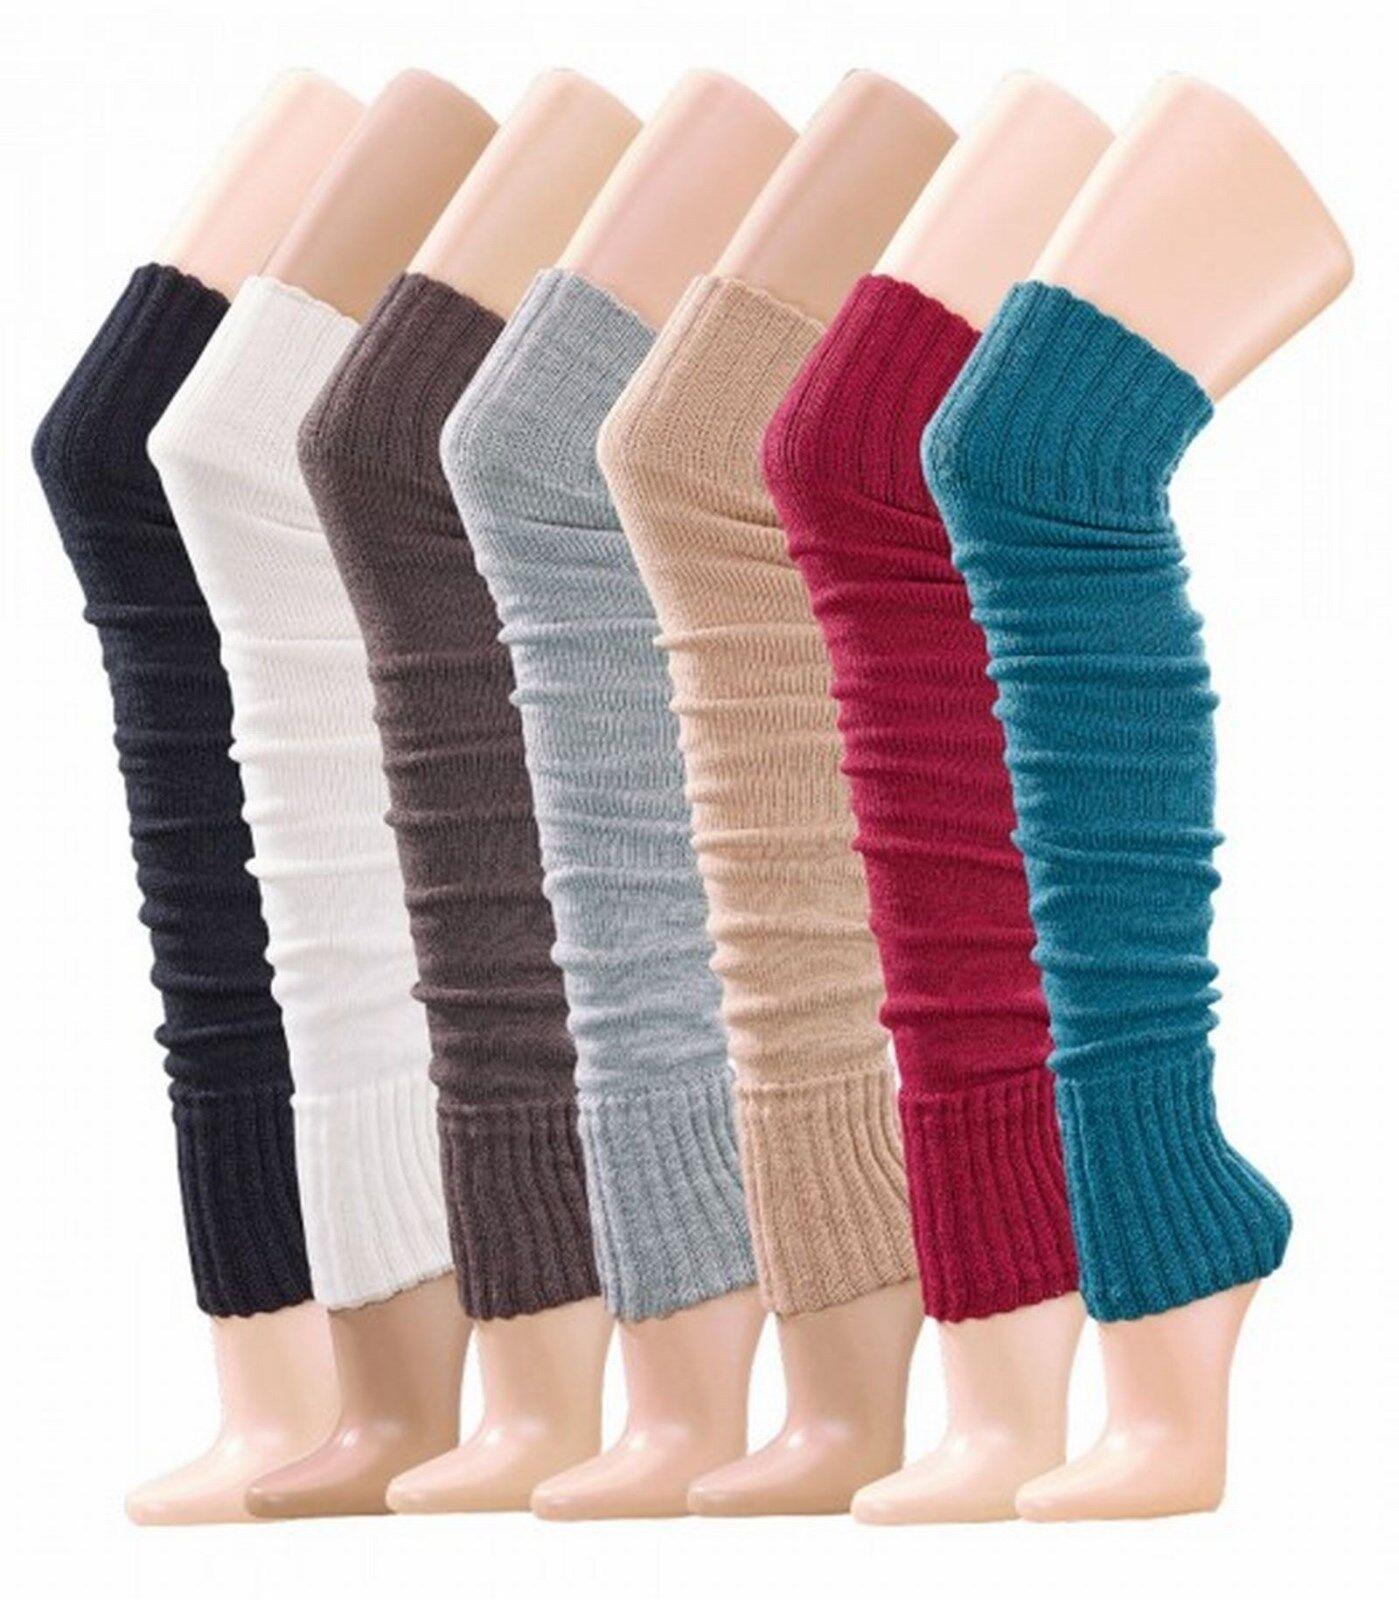 modische warme♦♦OVERKNEES♦♦halterlose Strick Stulpen♦Strümpfe Socken♦Overknee♦